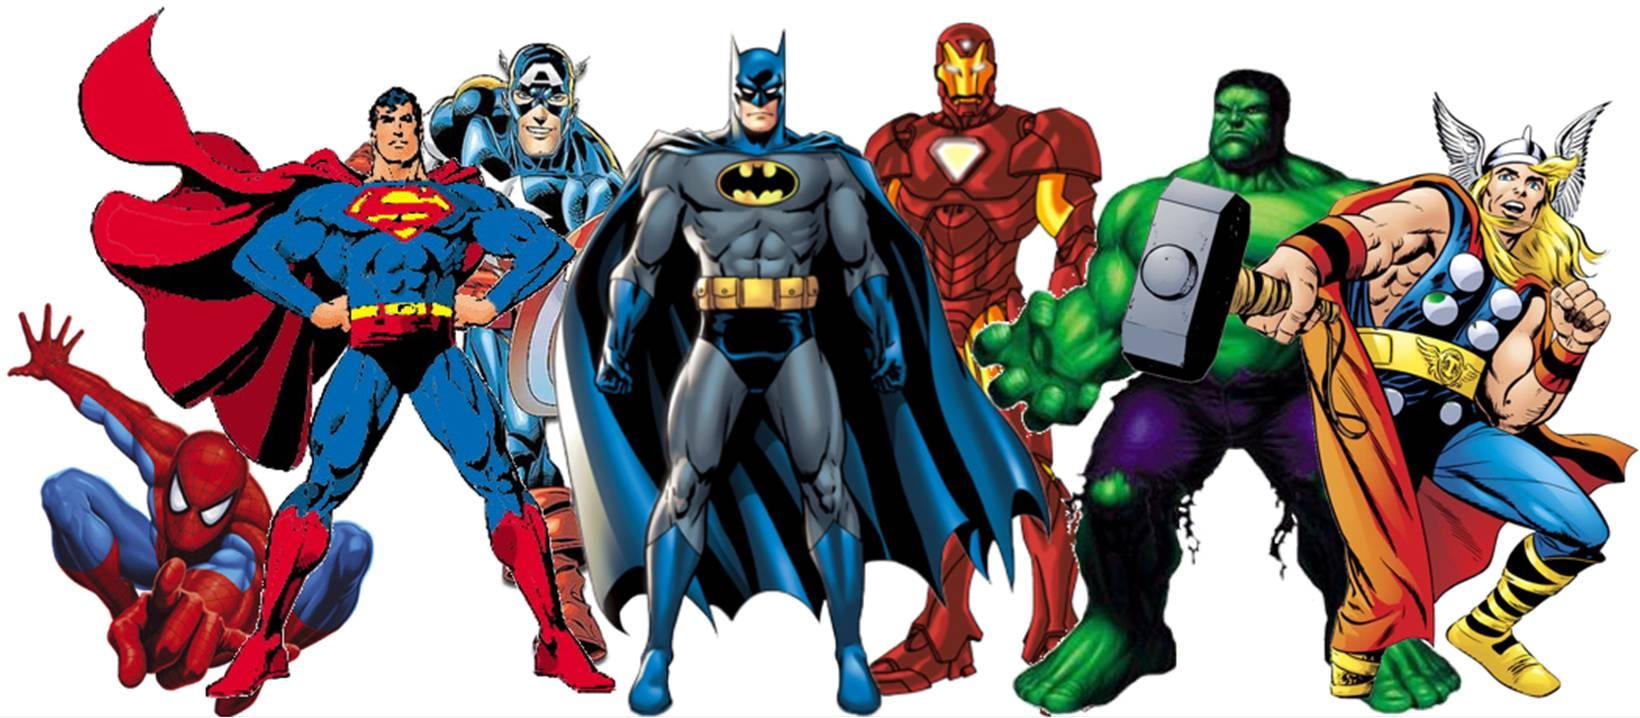 Uncategorized Batman Superman Spiderman batman vs superman spiderman images spiderman